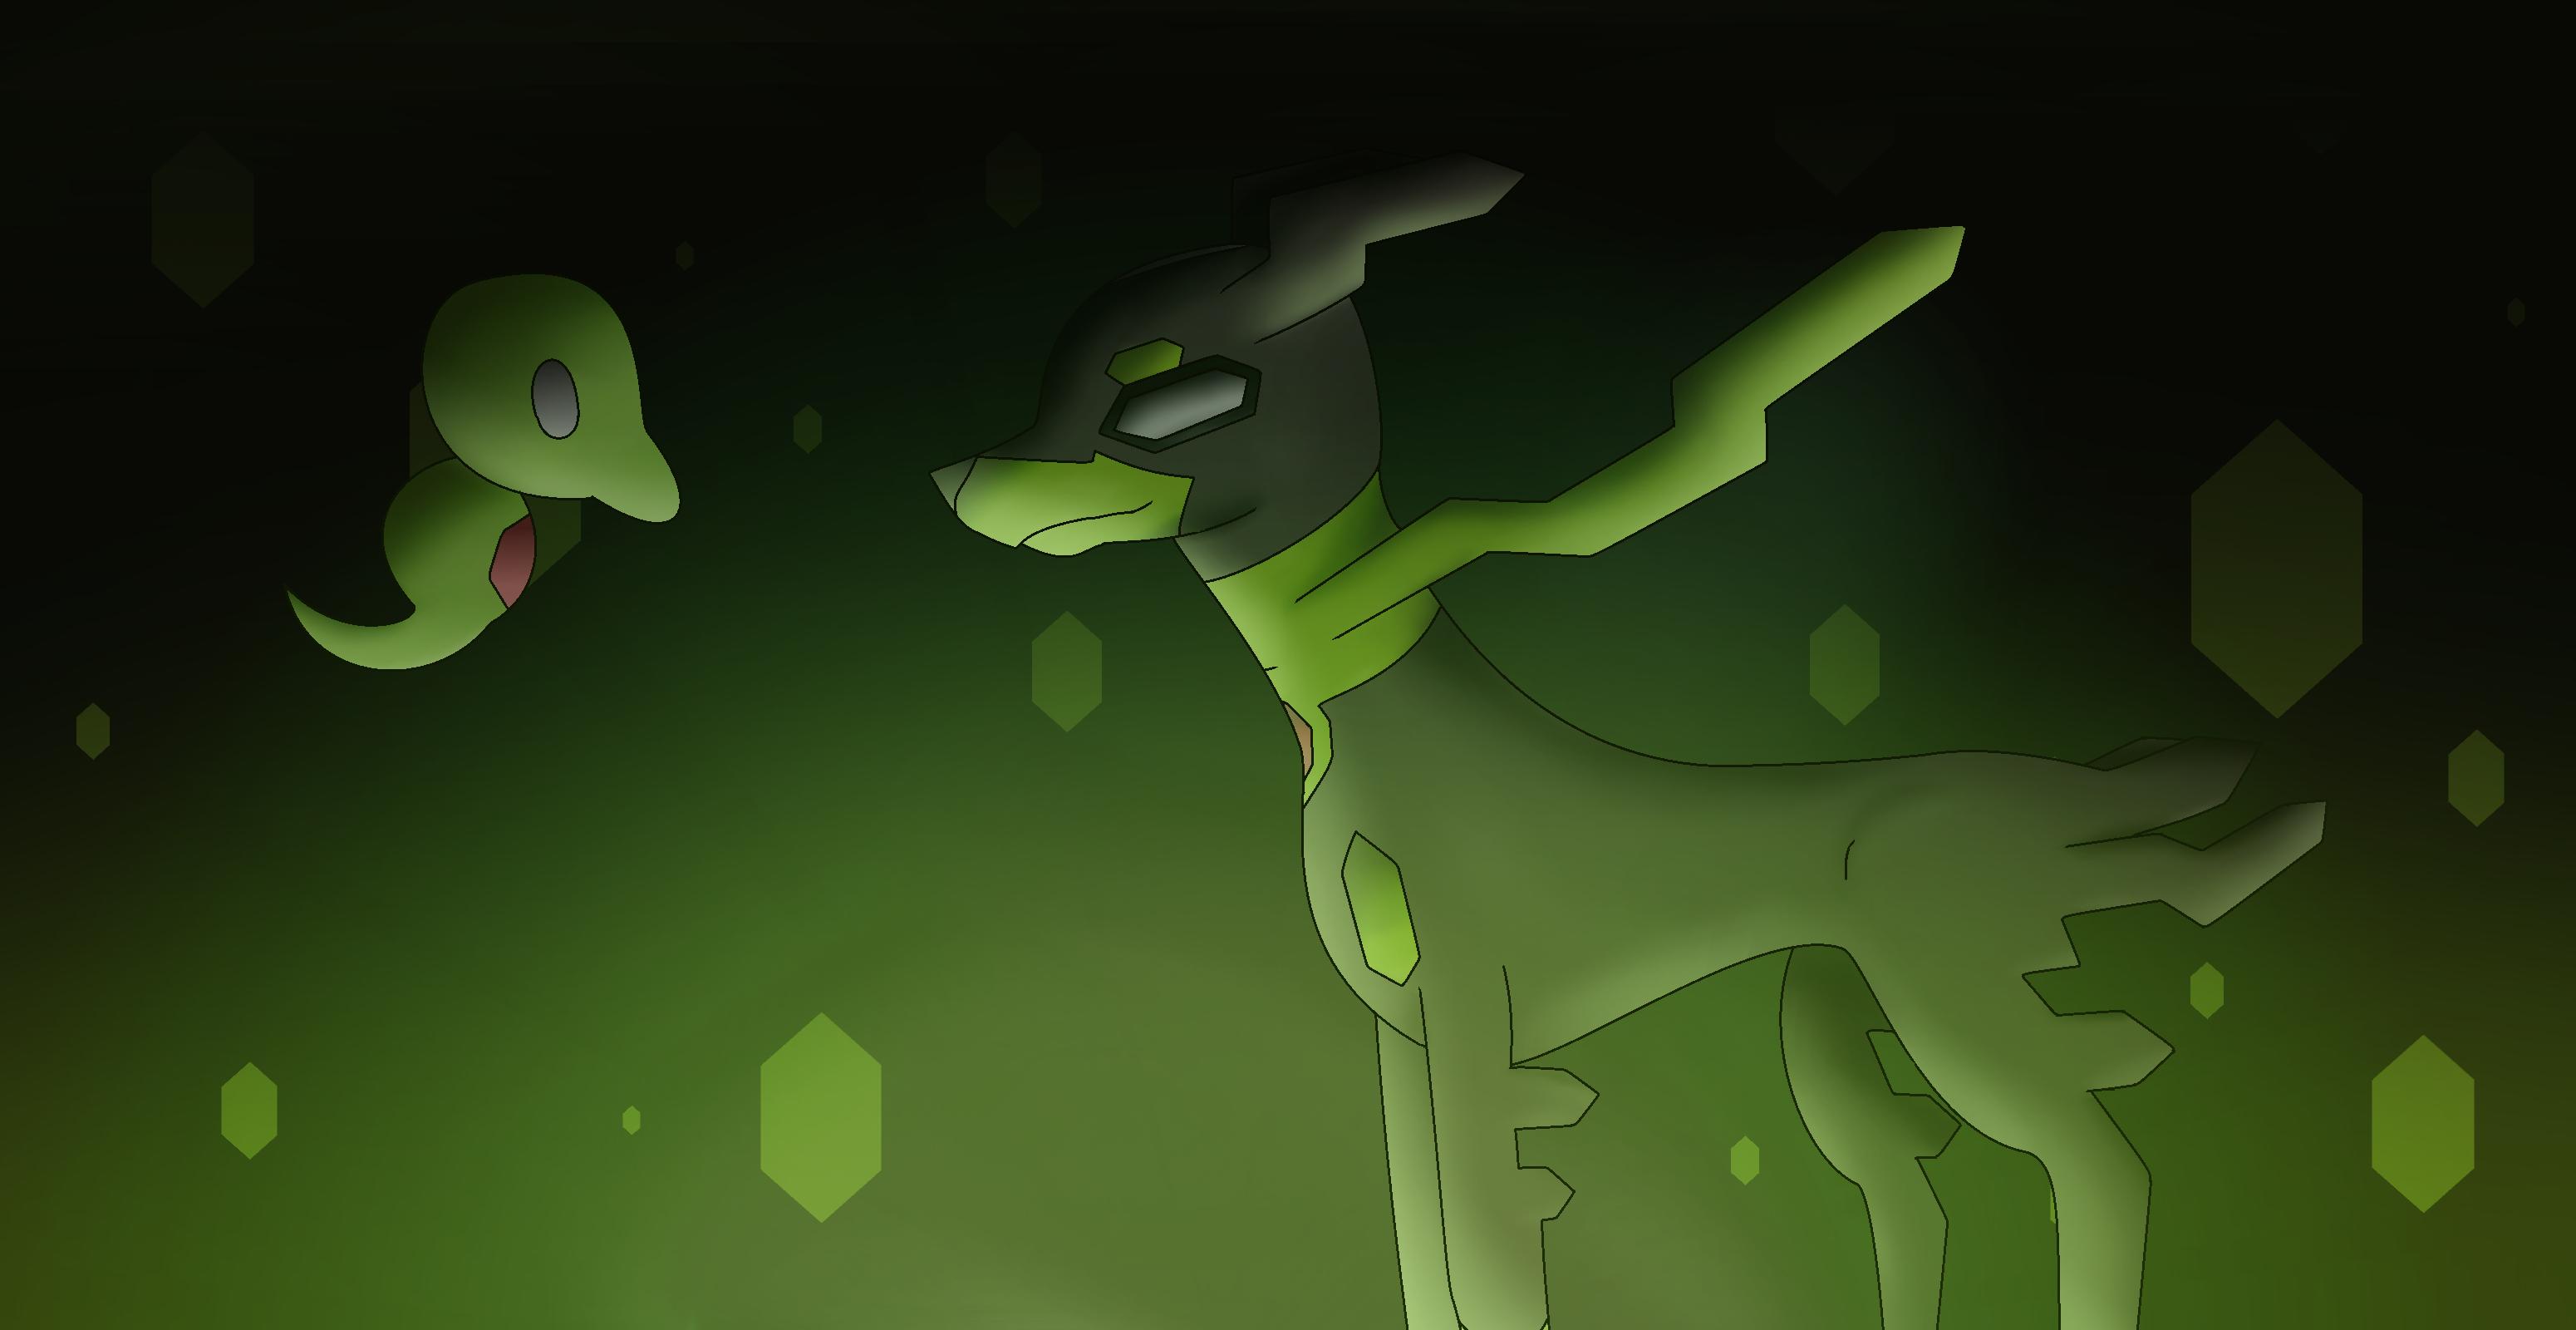 Zygarde 10% and Zygarde Core | Stuff I Made | Pinterest | Pokémon